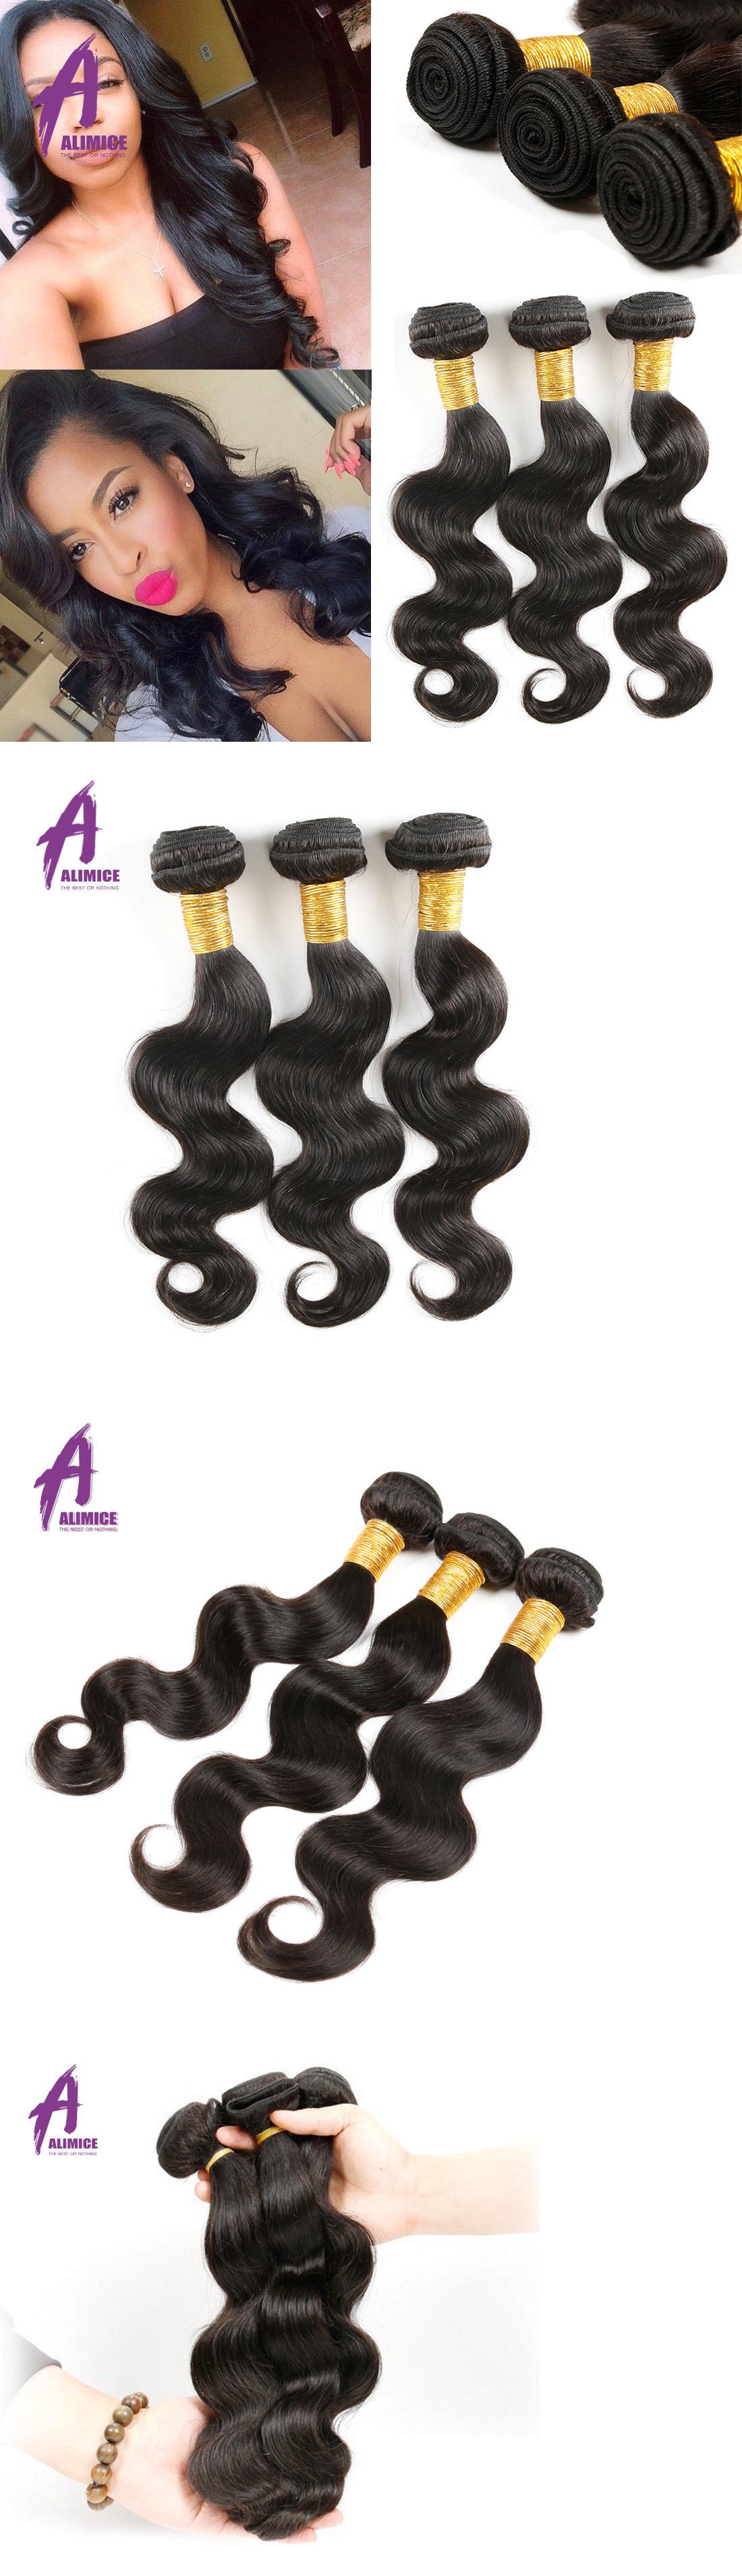 Hair Extensions Brazilian Virgin Body Wave Human Hair Bundles Weave